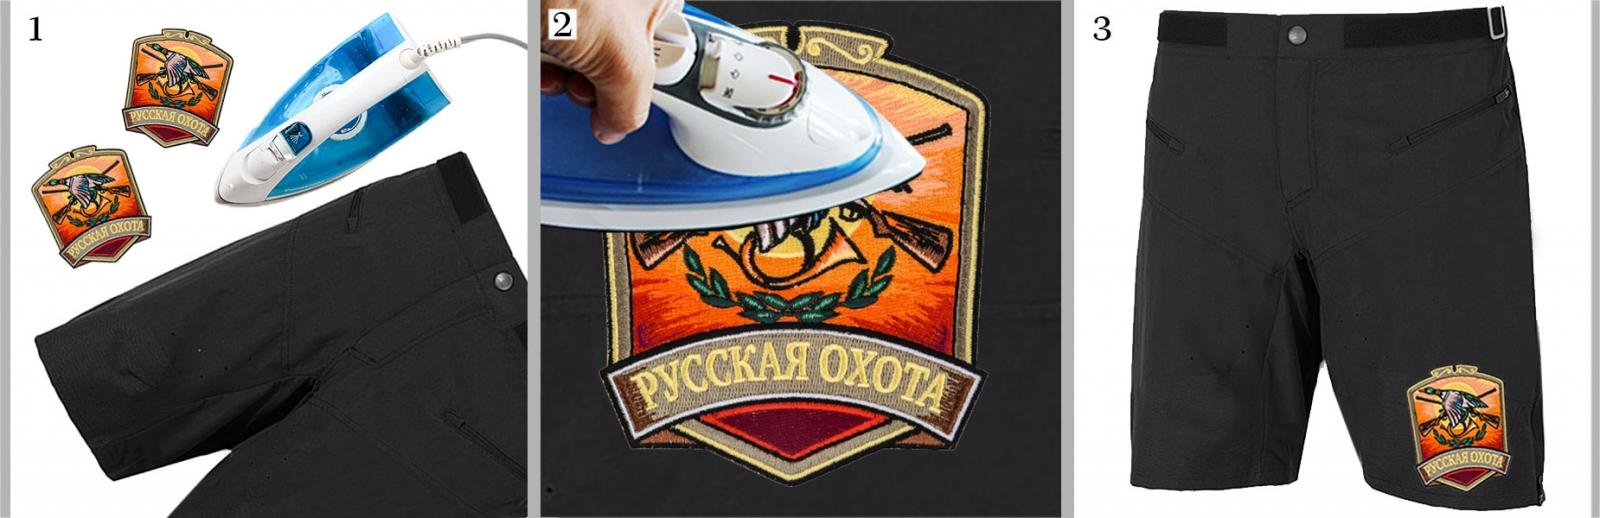 "Нашивка на одежду ""Русская охота"" на шортах"